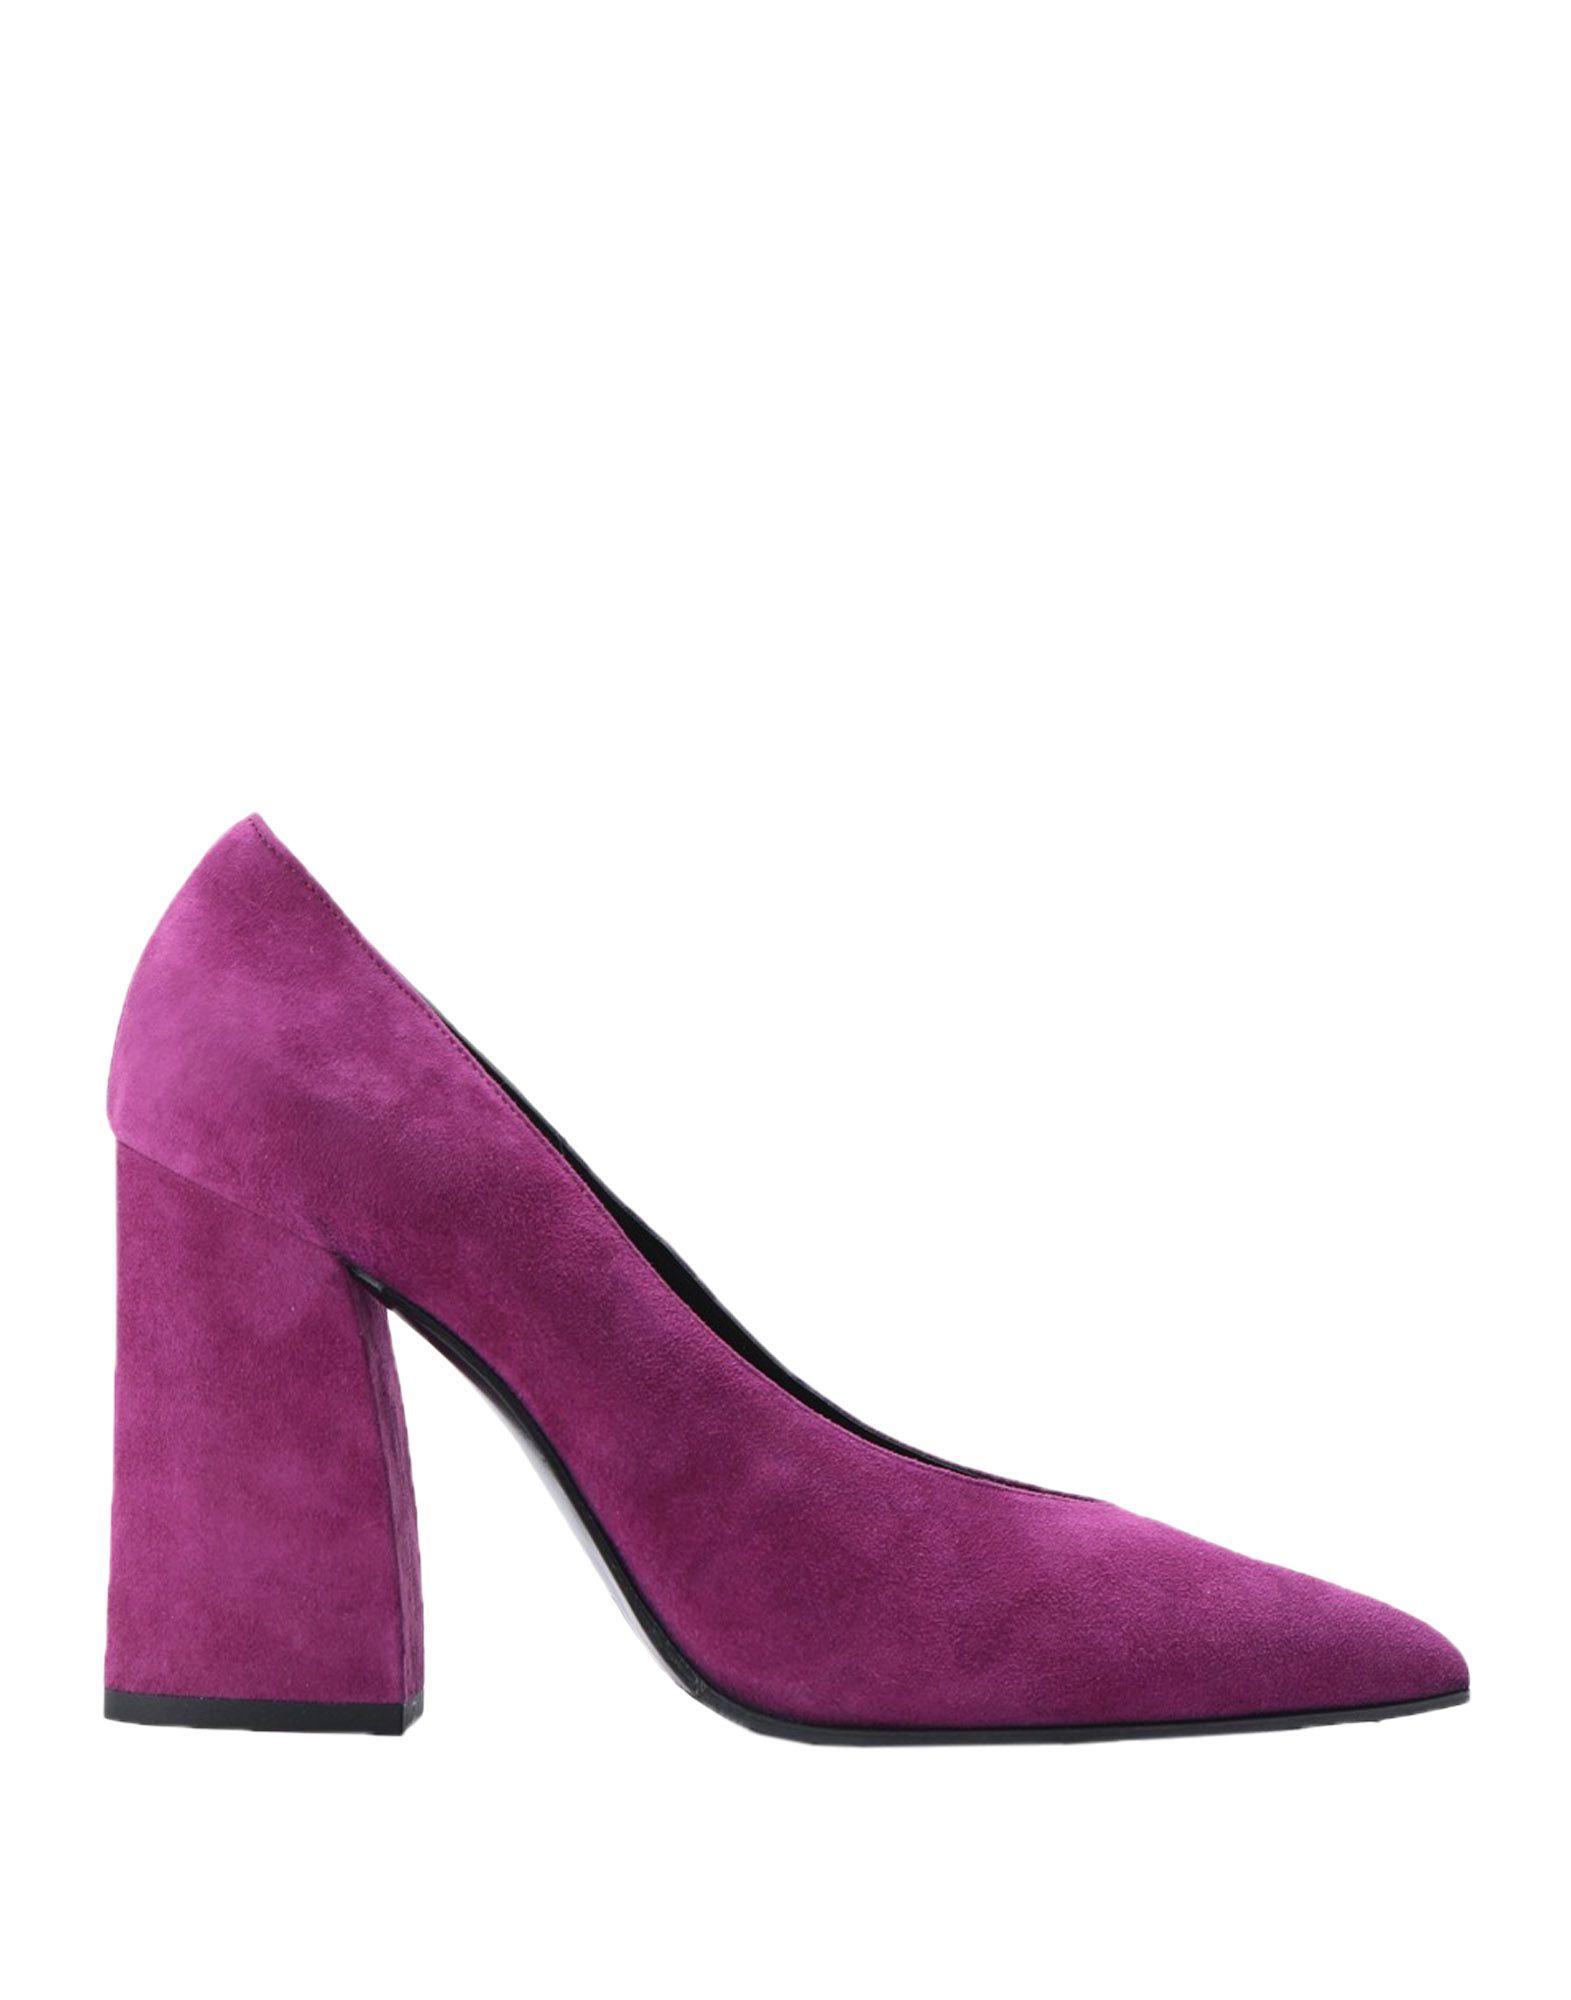 Escarpins Roberto Festa Femme - Escarpins Roberto Festa Violet Chaussures casual sauvages